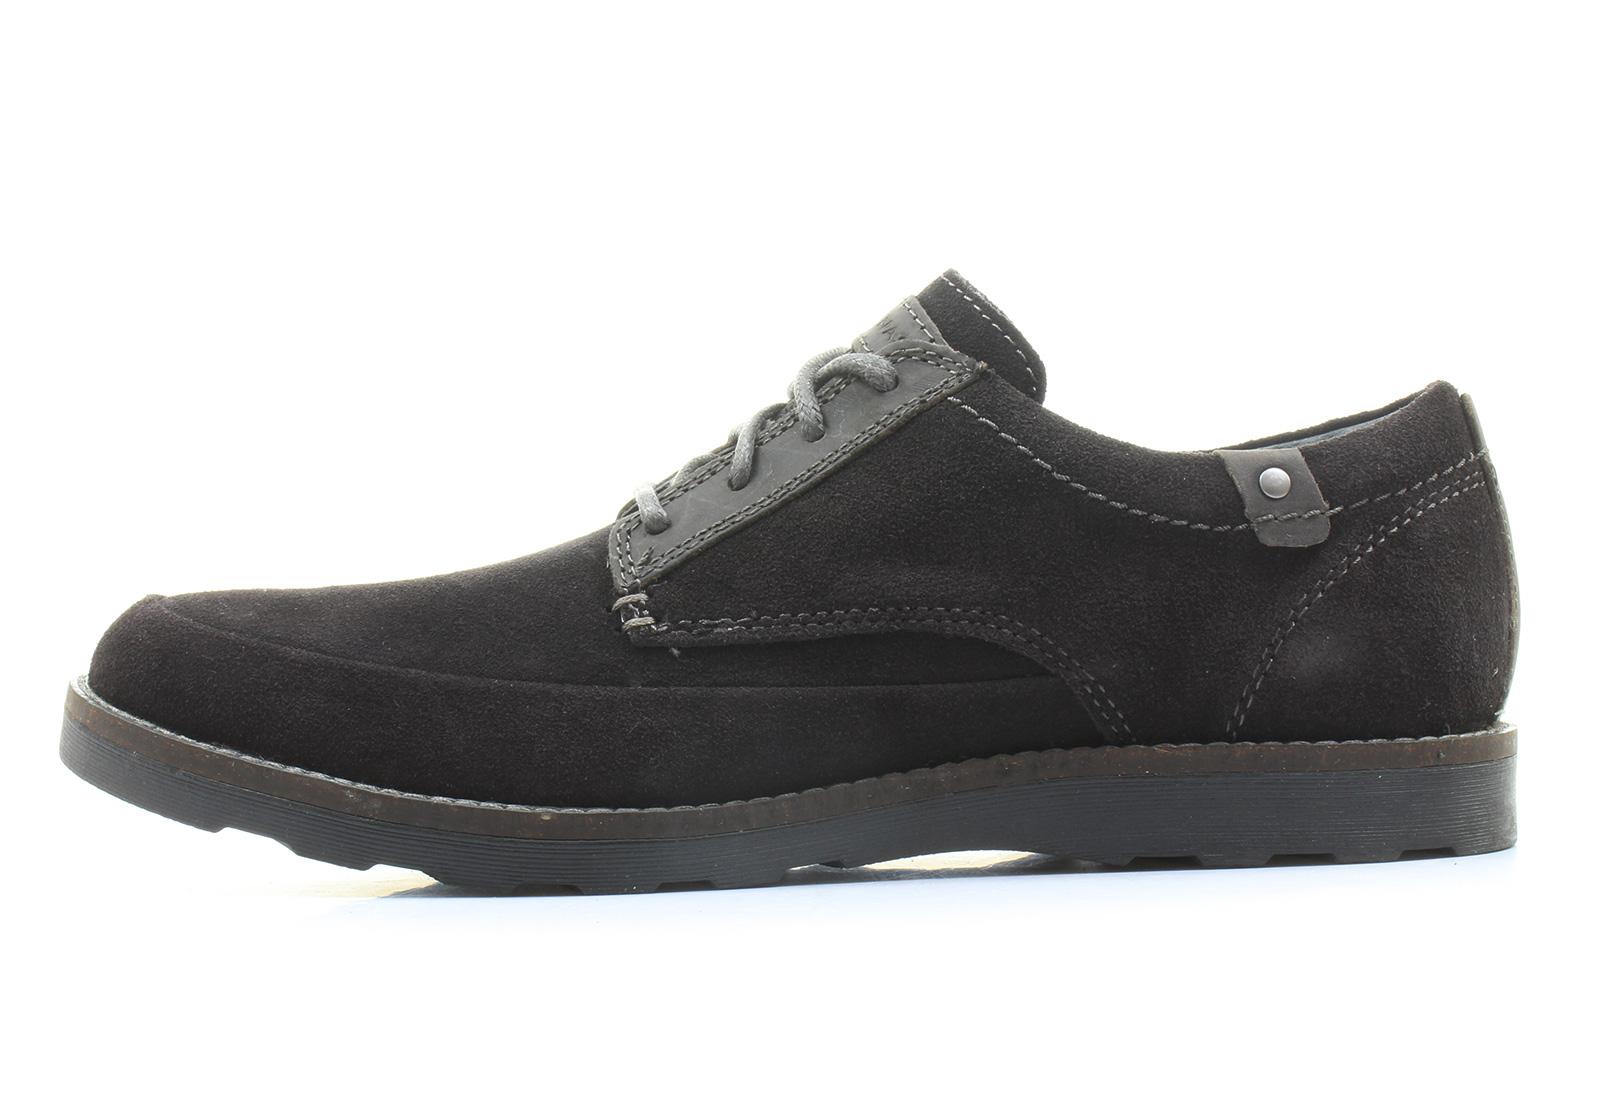 Birchwood Vans Shoes